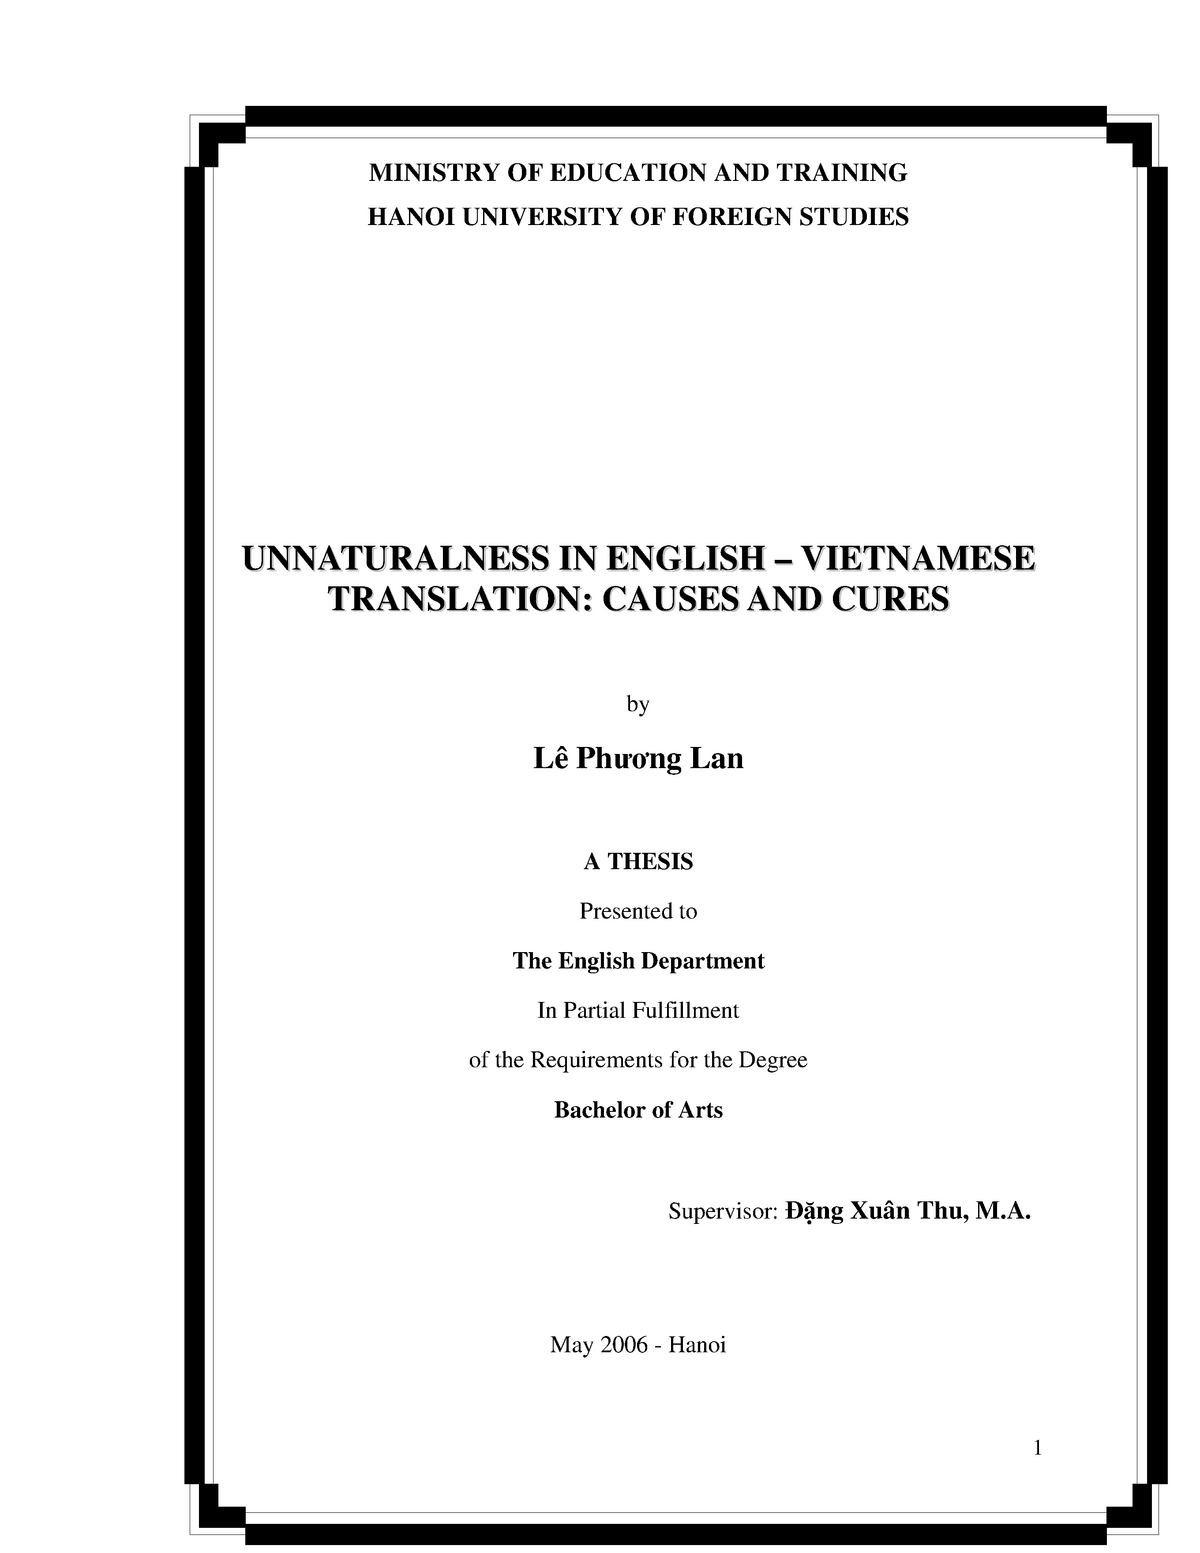 52651990 Unnaturalness in English Vietnamese Translation